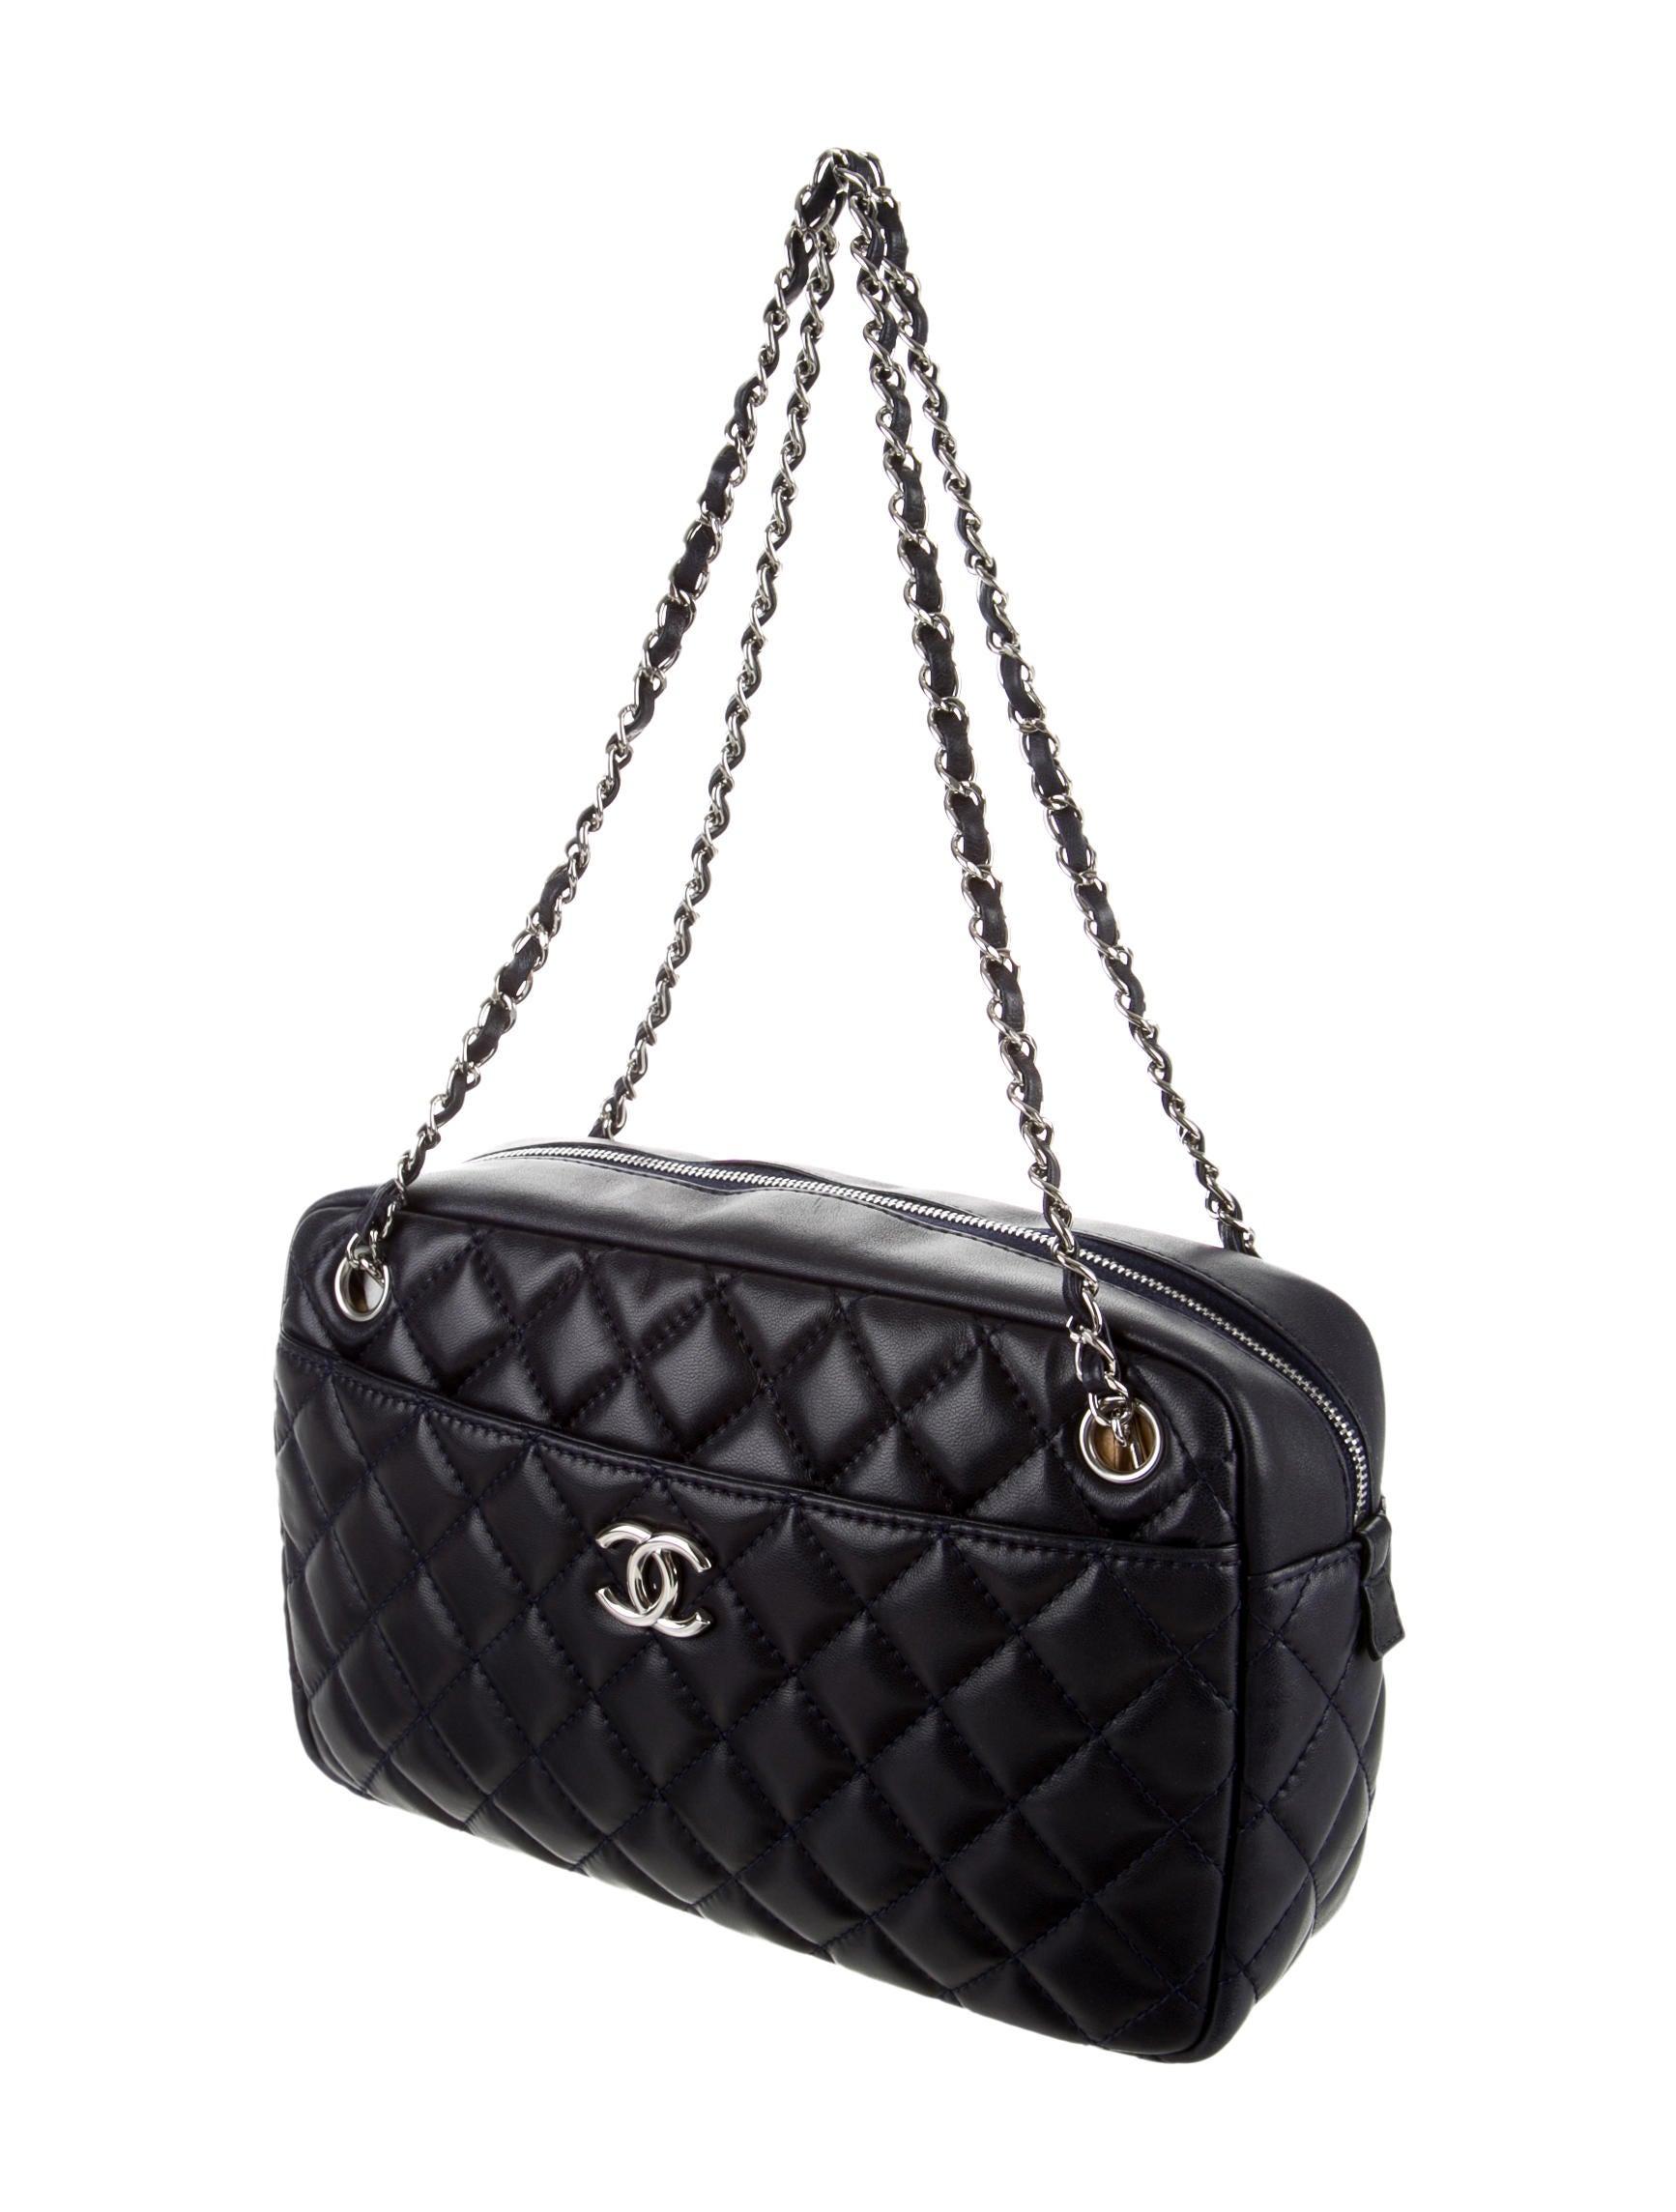 Chanel Quilted Medium Camera Bag